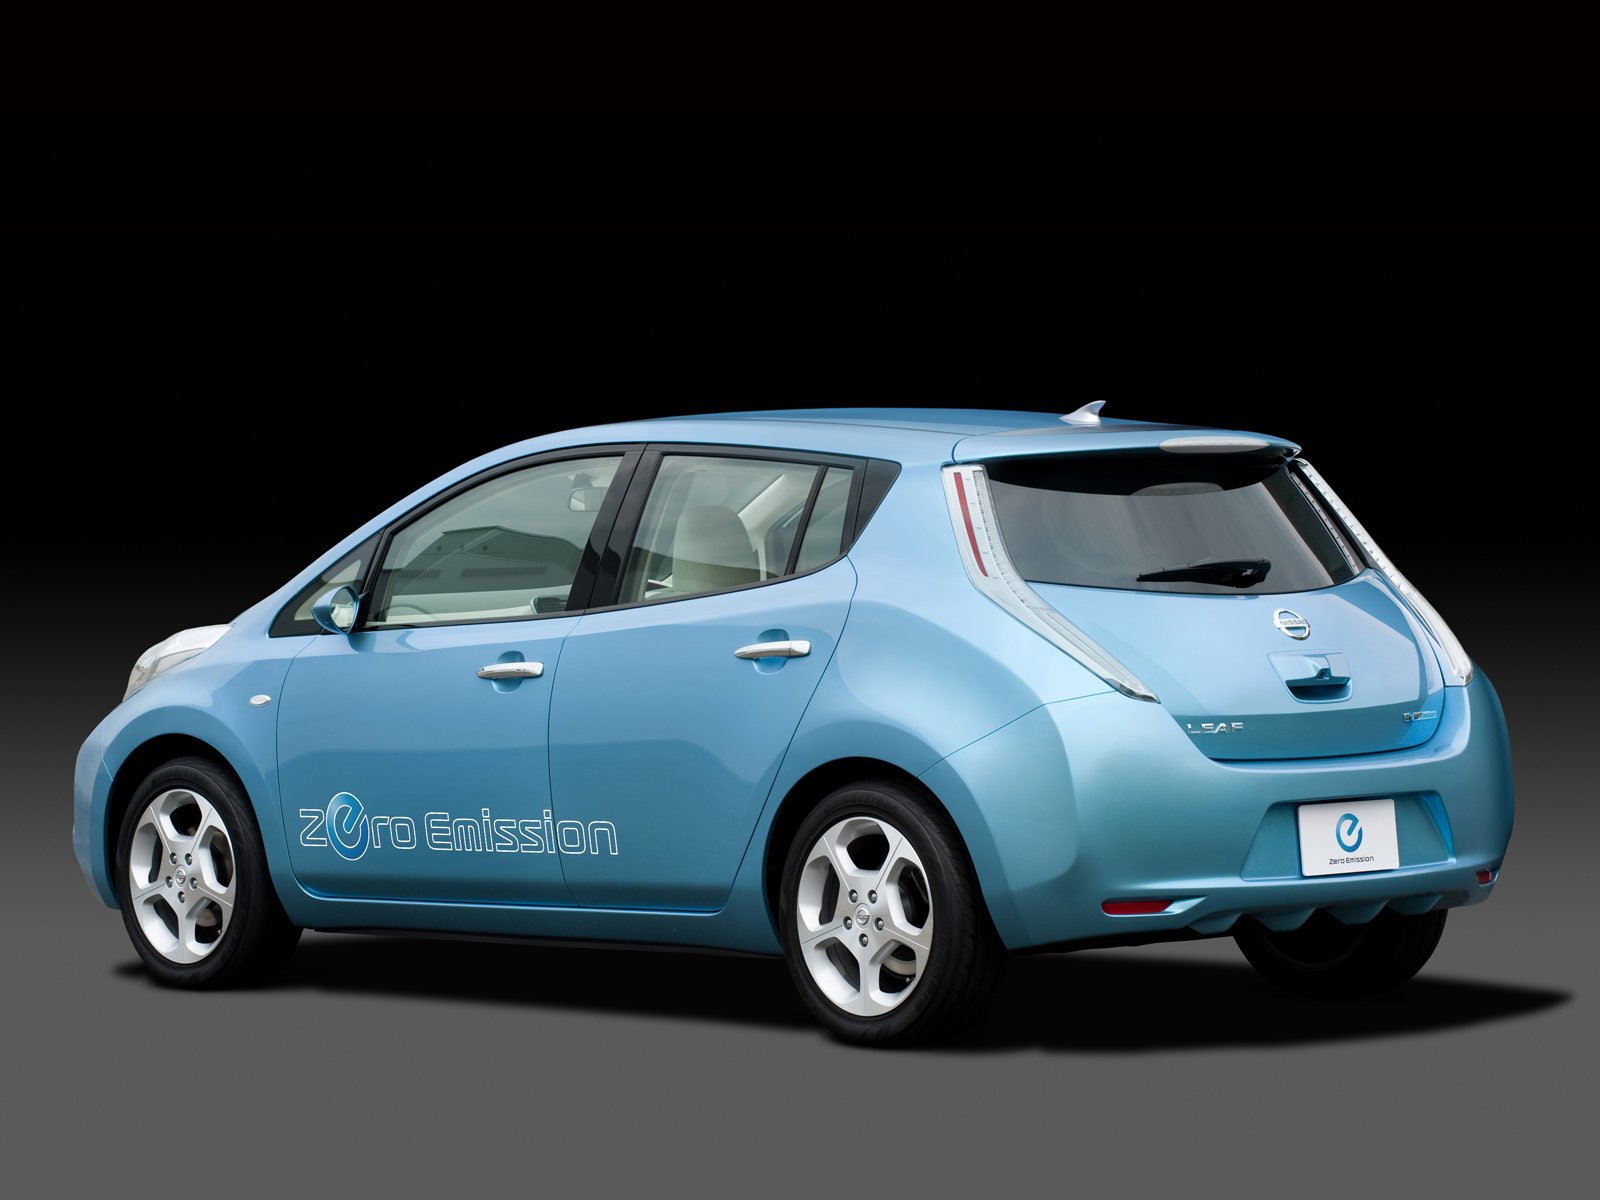 Car Photos, Review, Features, Insurance Information, Specs.